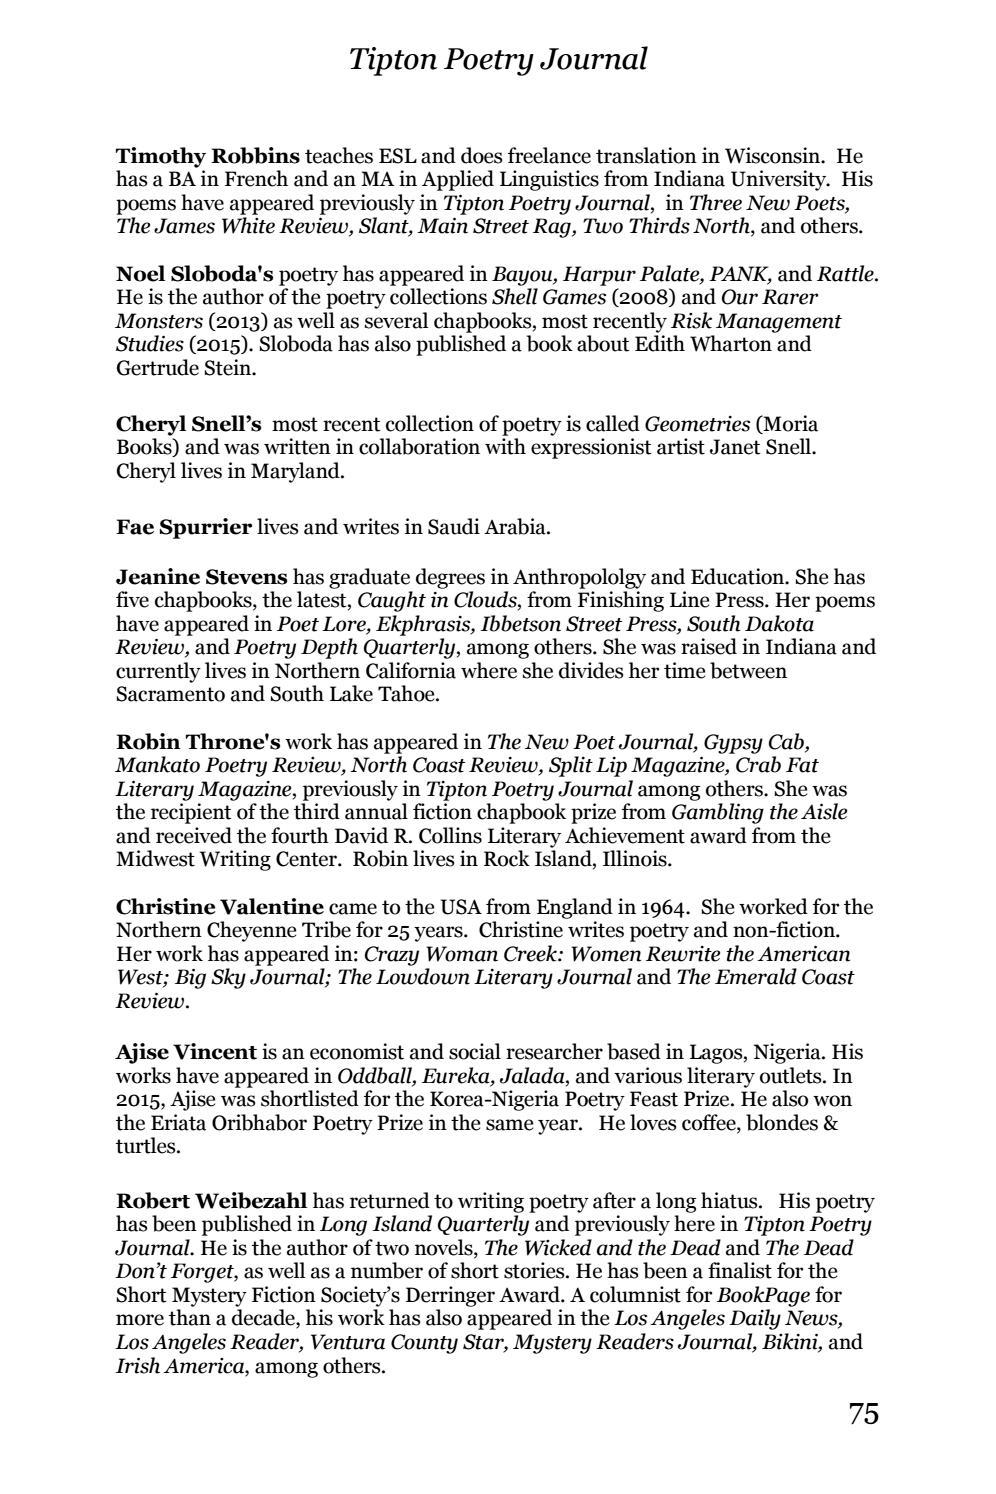 Tipton Poetry Journal #30 by Tipton Poetry Journal - issuu